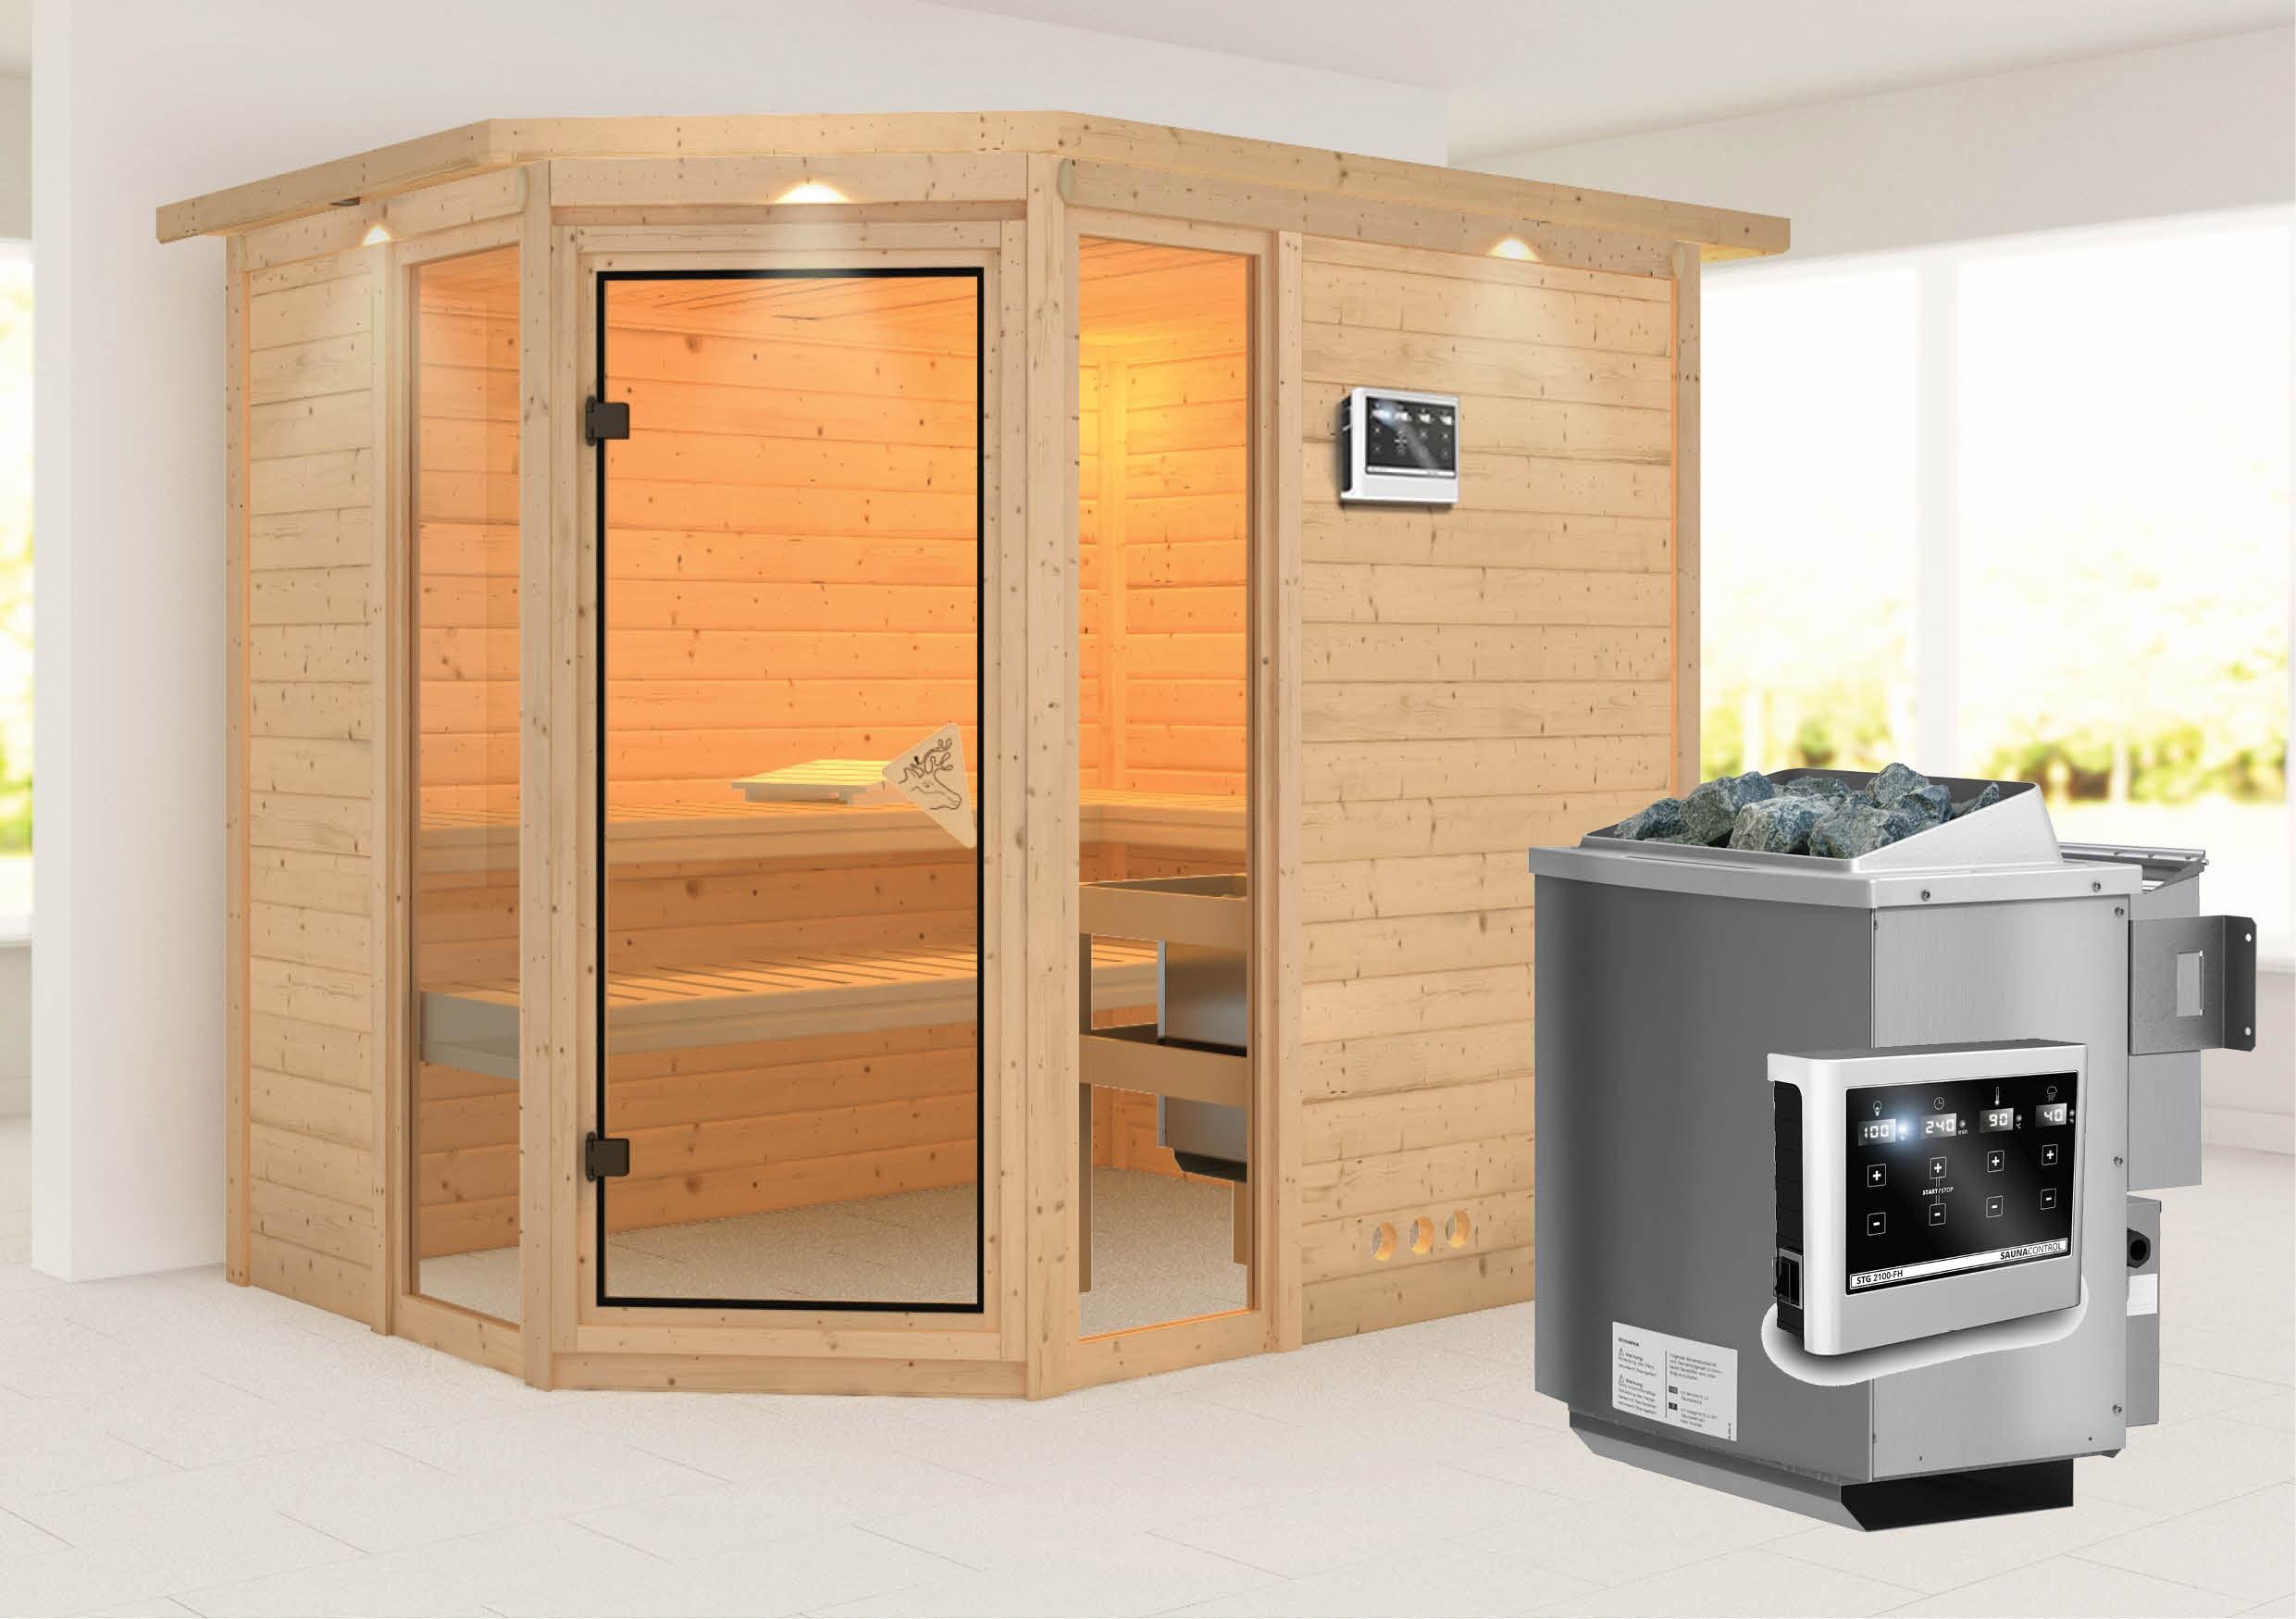 karibu sauna sinai3 40mm dachkranz bio ofen 9kw extern classic t r bei. Black Bedroom Furniture Sets. Home Design Ideas